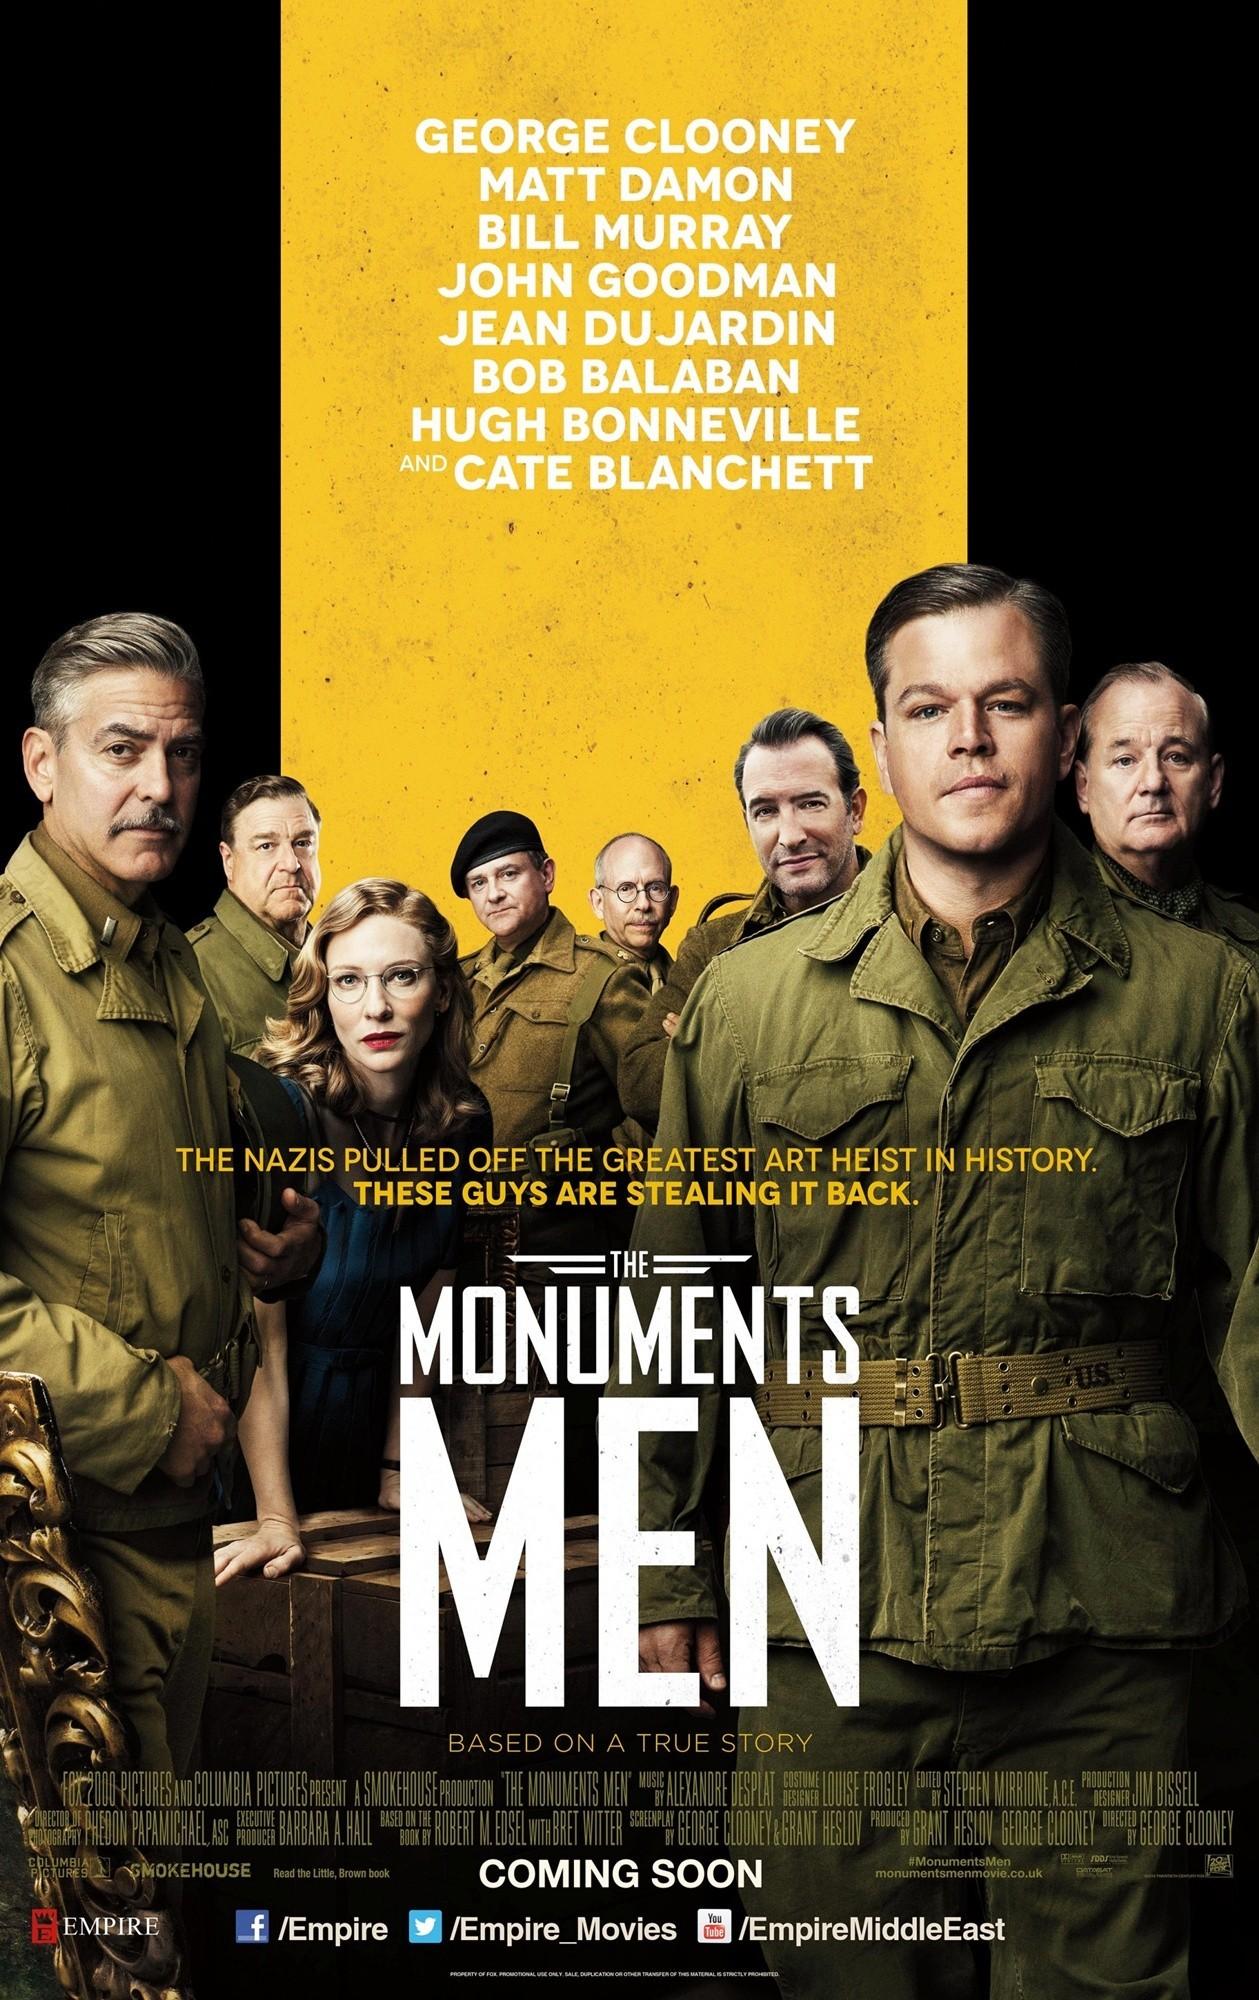 http://sideonetrackone.com/wp-content/uploads/2014/02/the-monuments-men-poster02.jpg